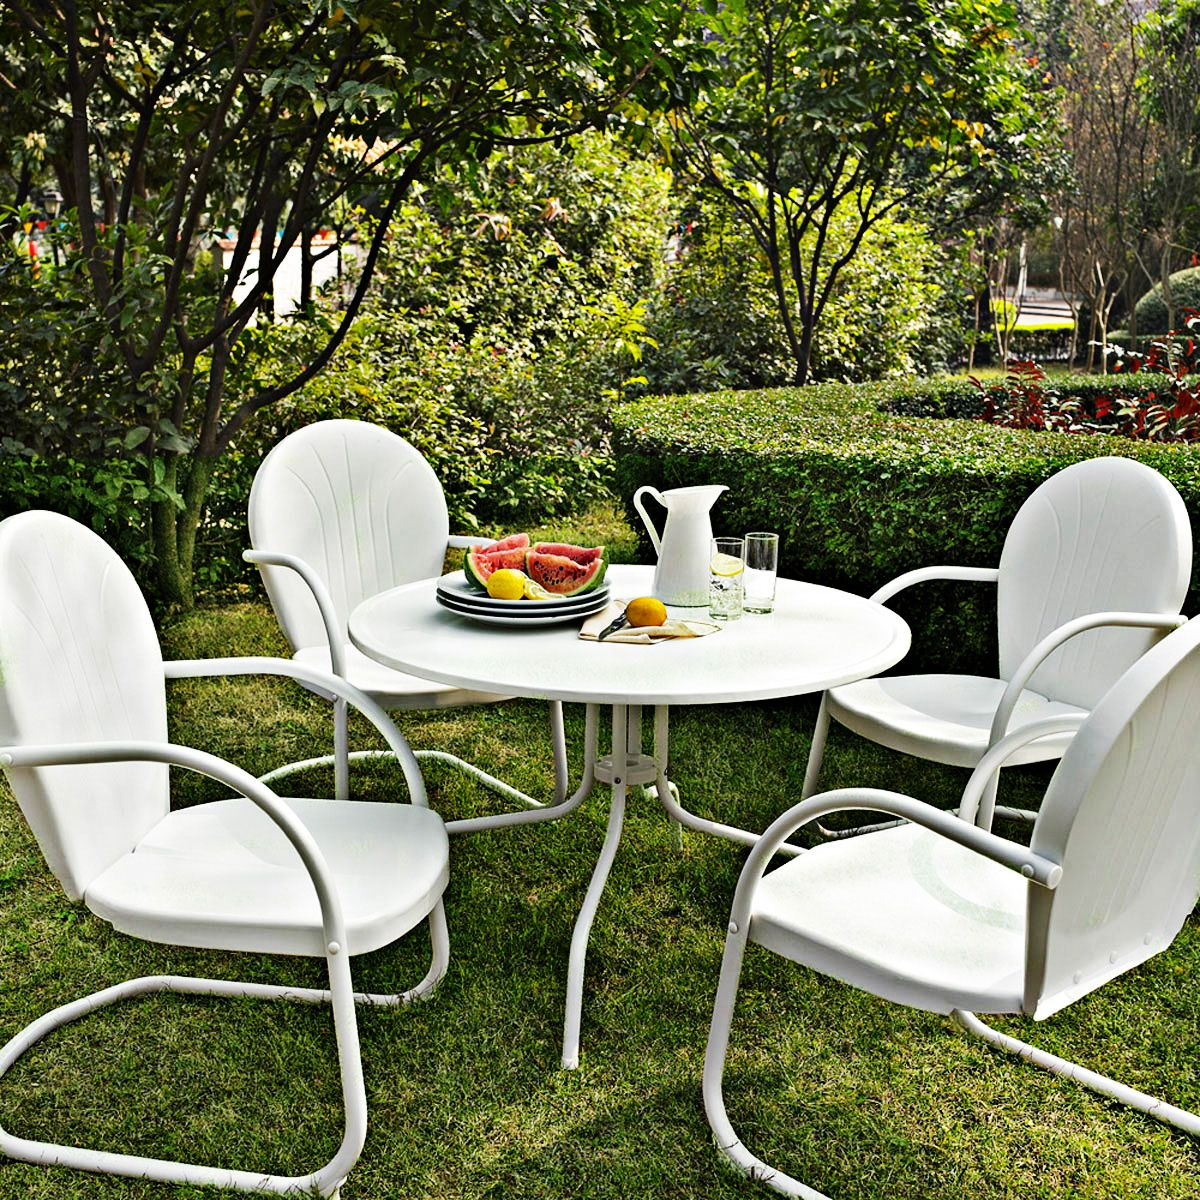 griffith nostalgic white 5 piece outdoor patio dining set